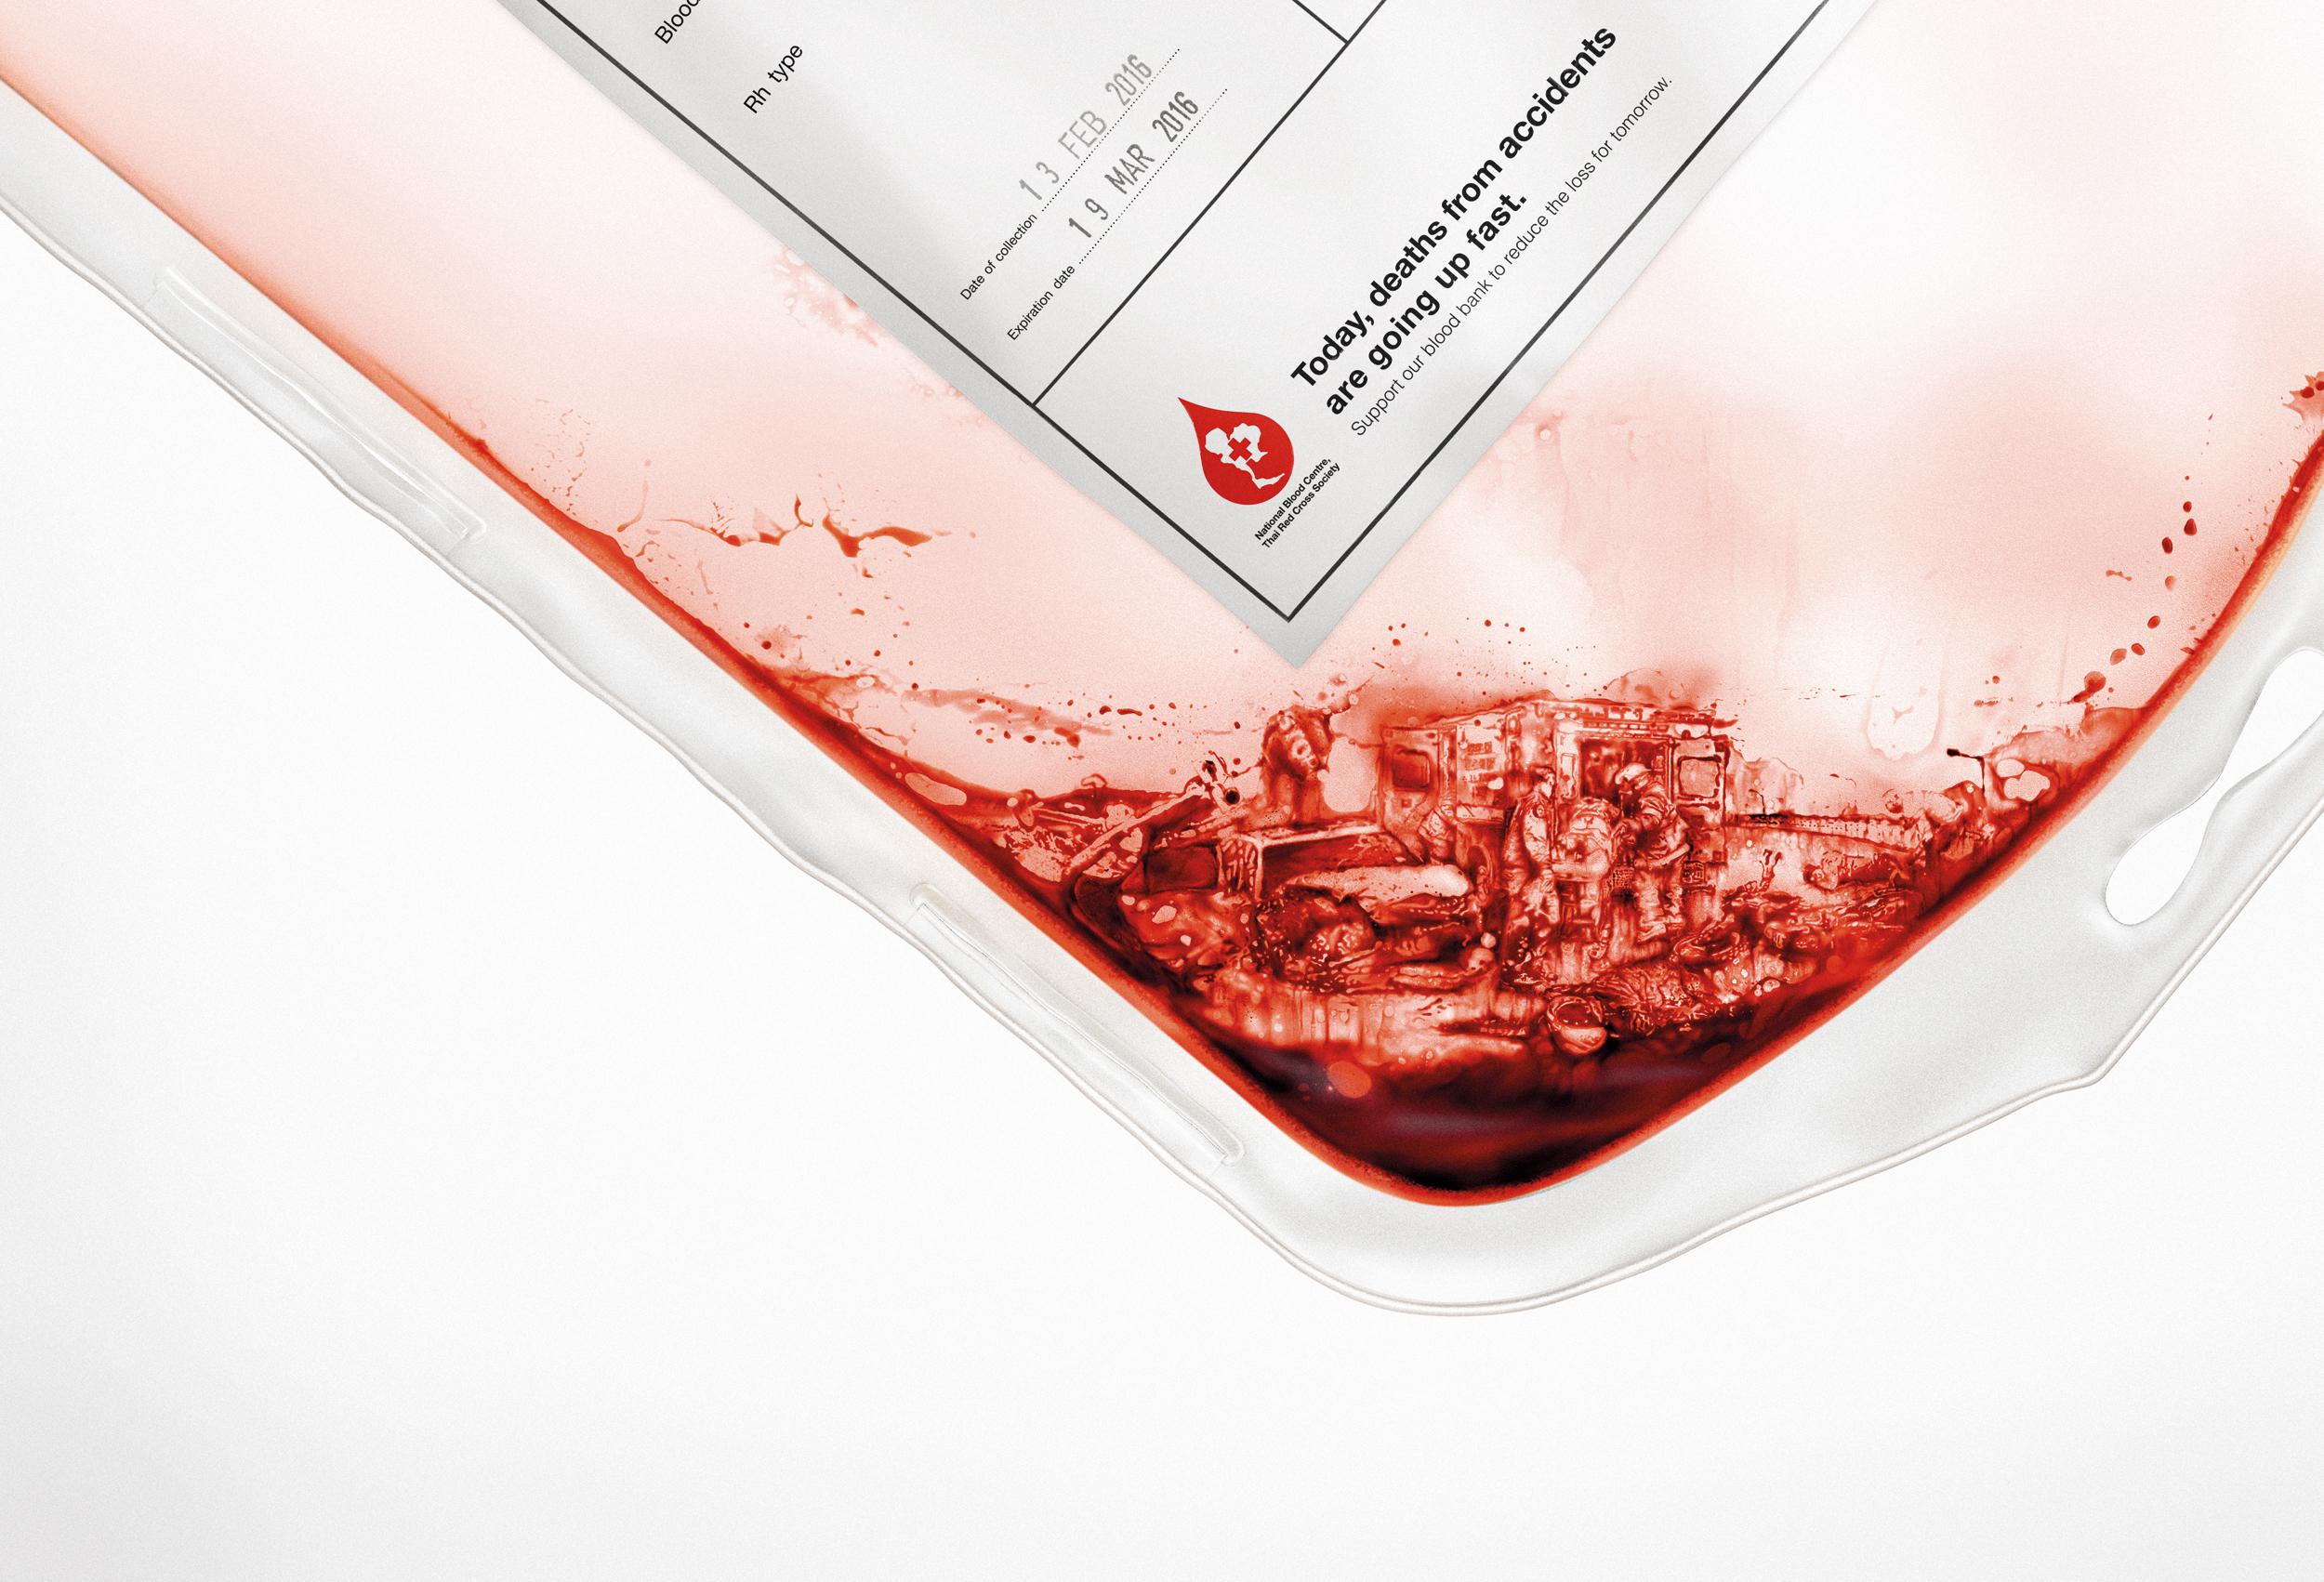 C_RED_CROSS_Caraccident_21_new Crop Srgb.jpg